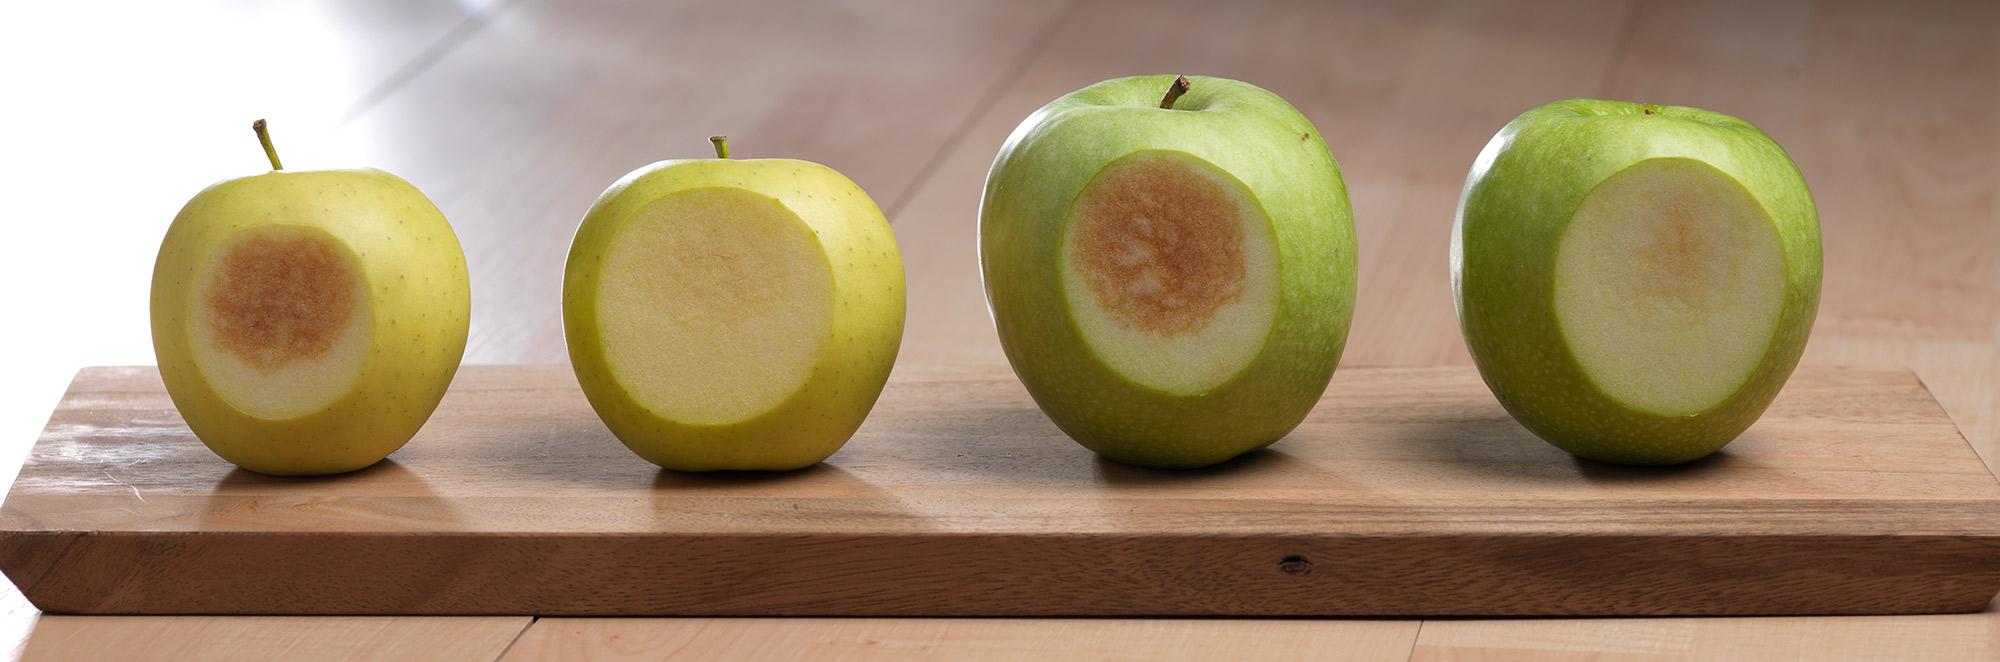 Farm Babe: Arctic Apple may help change perception of GMOs